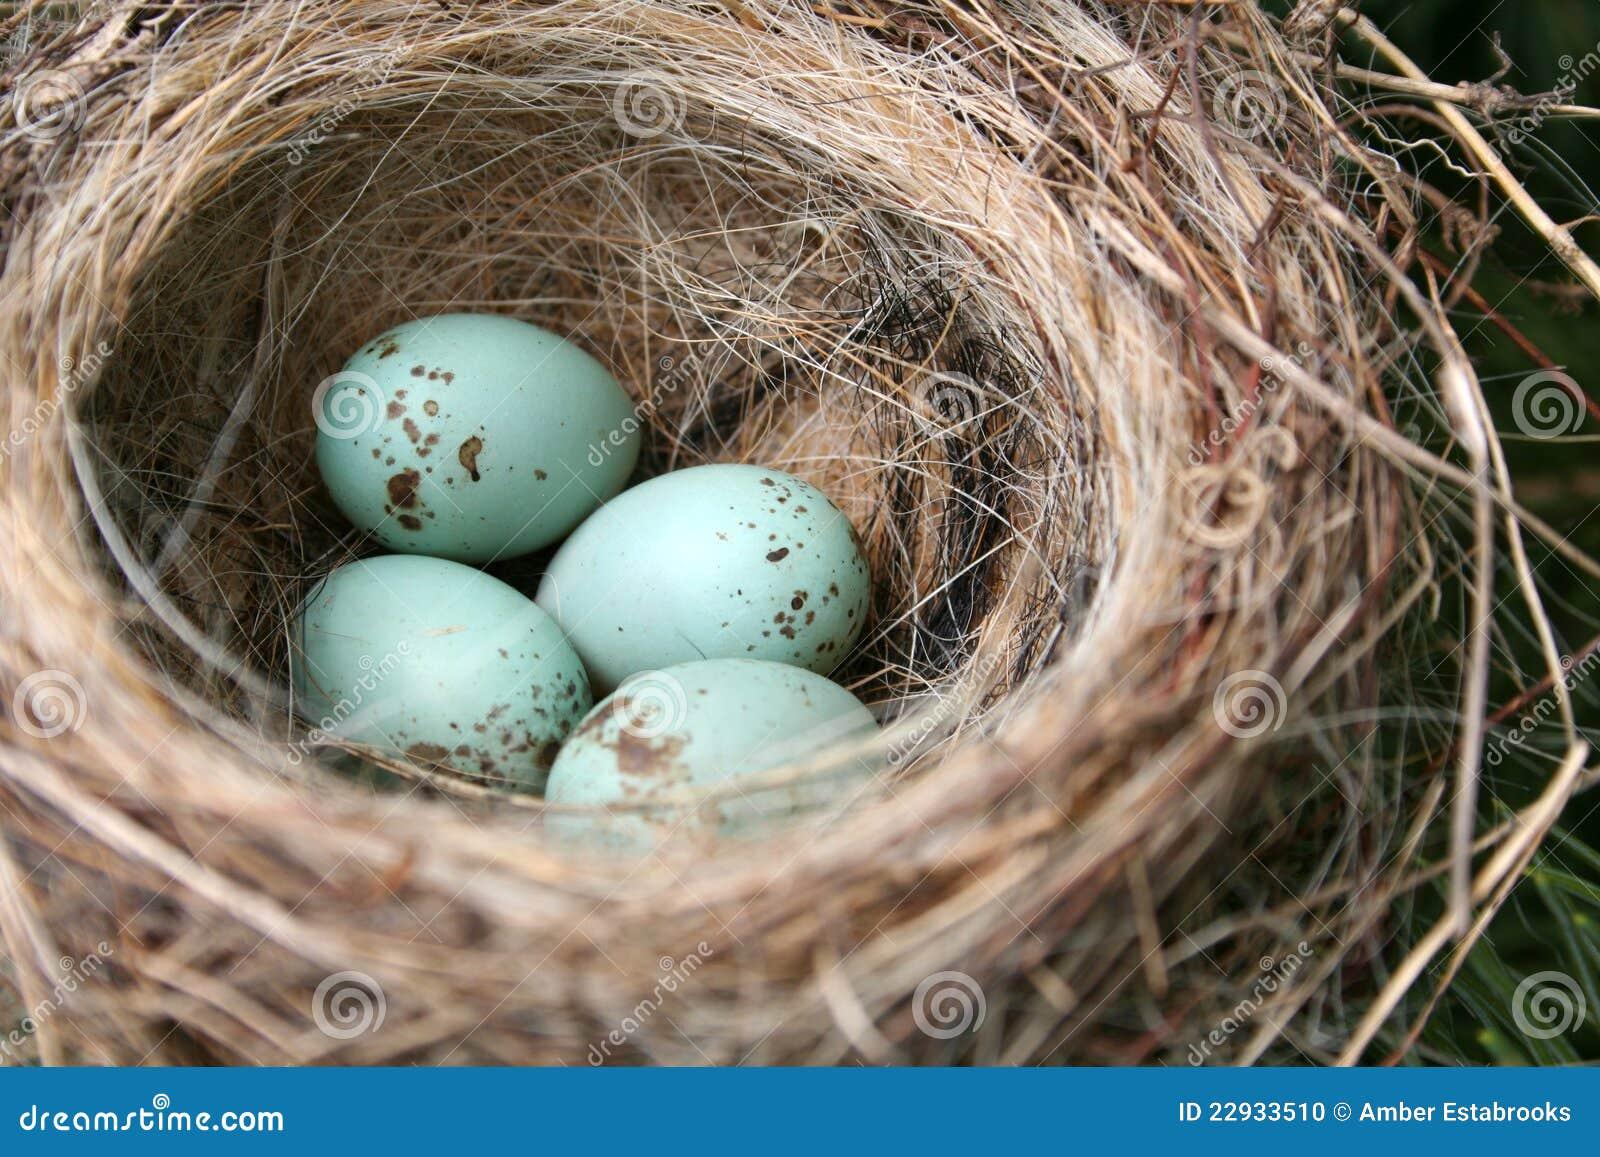 Jajko amerykański rudzik